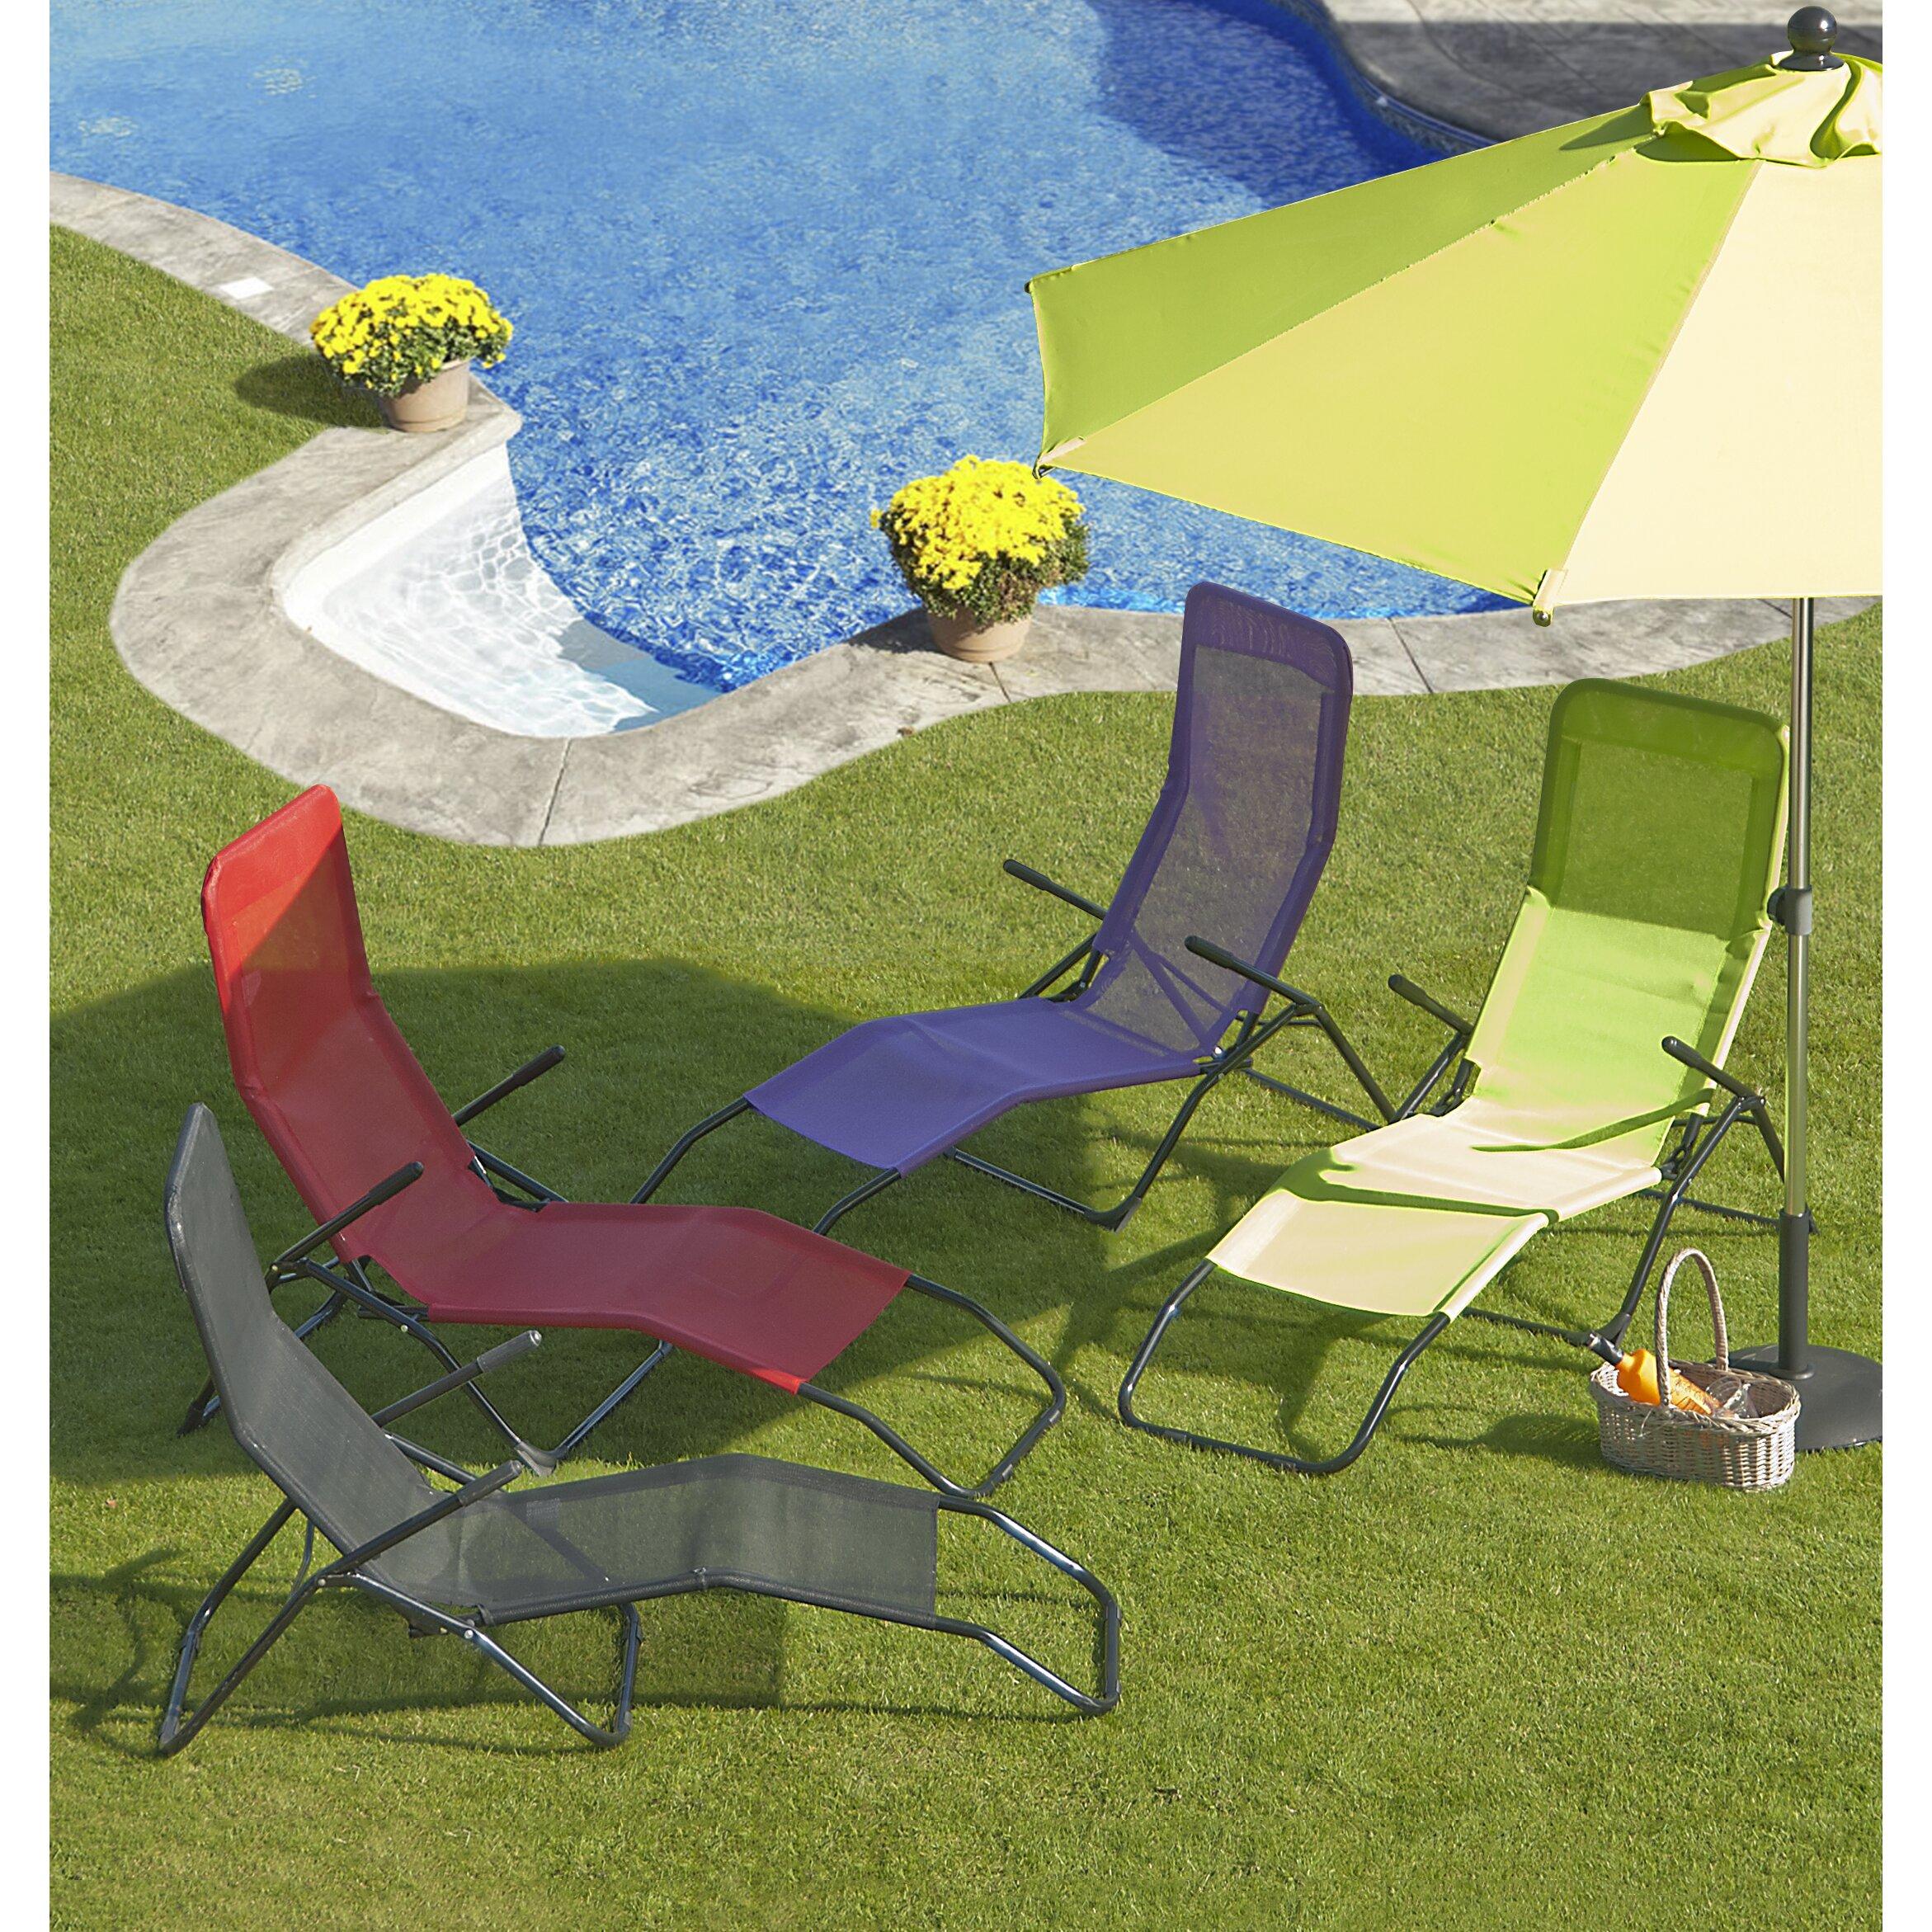 SunTime Outdoor Living Siesta Zero Gravity Chair & Reviews ... on Suntime Outdoor Living id=22169